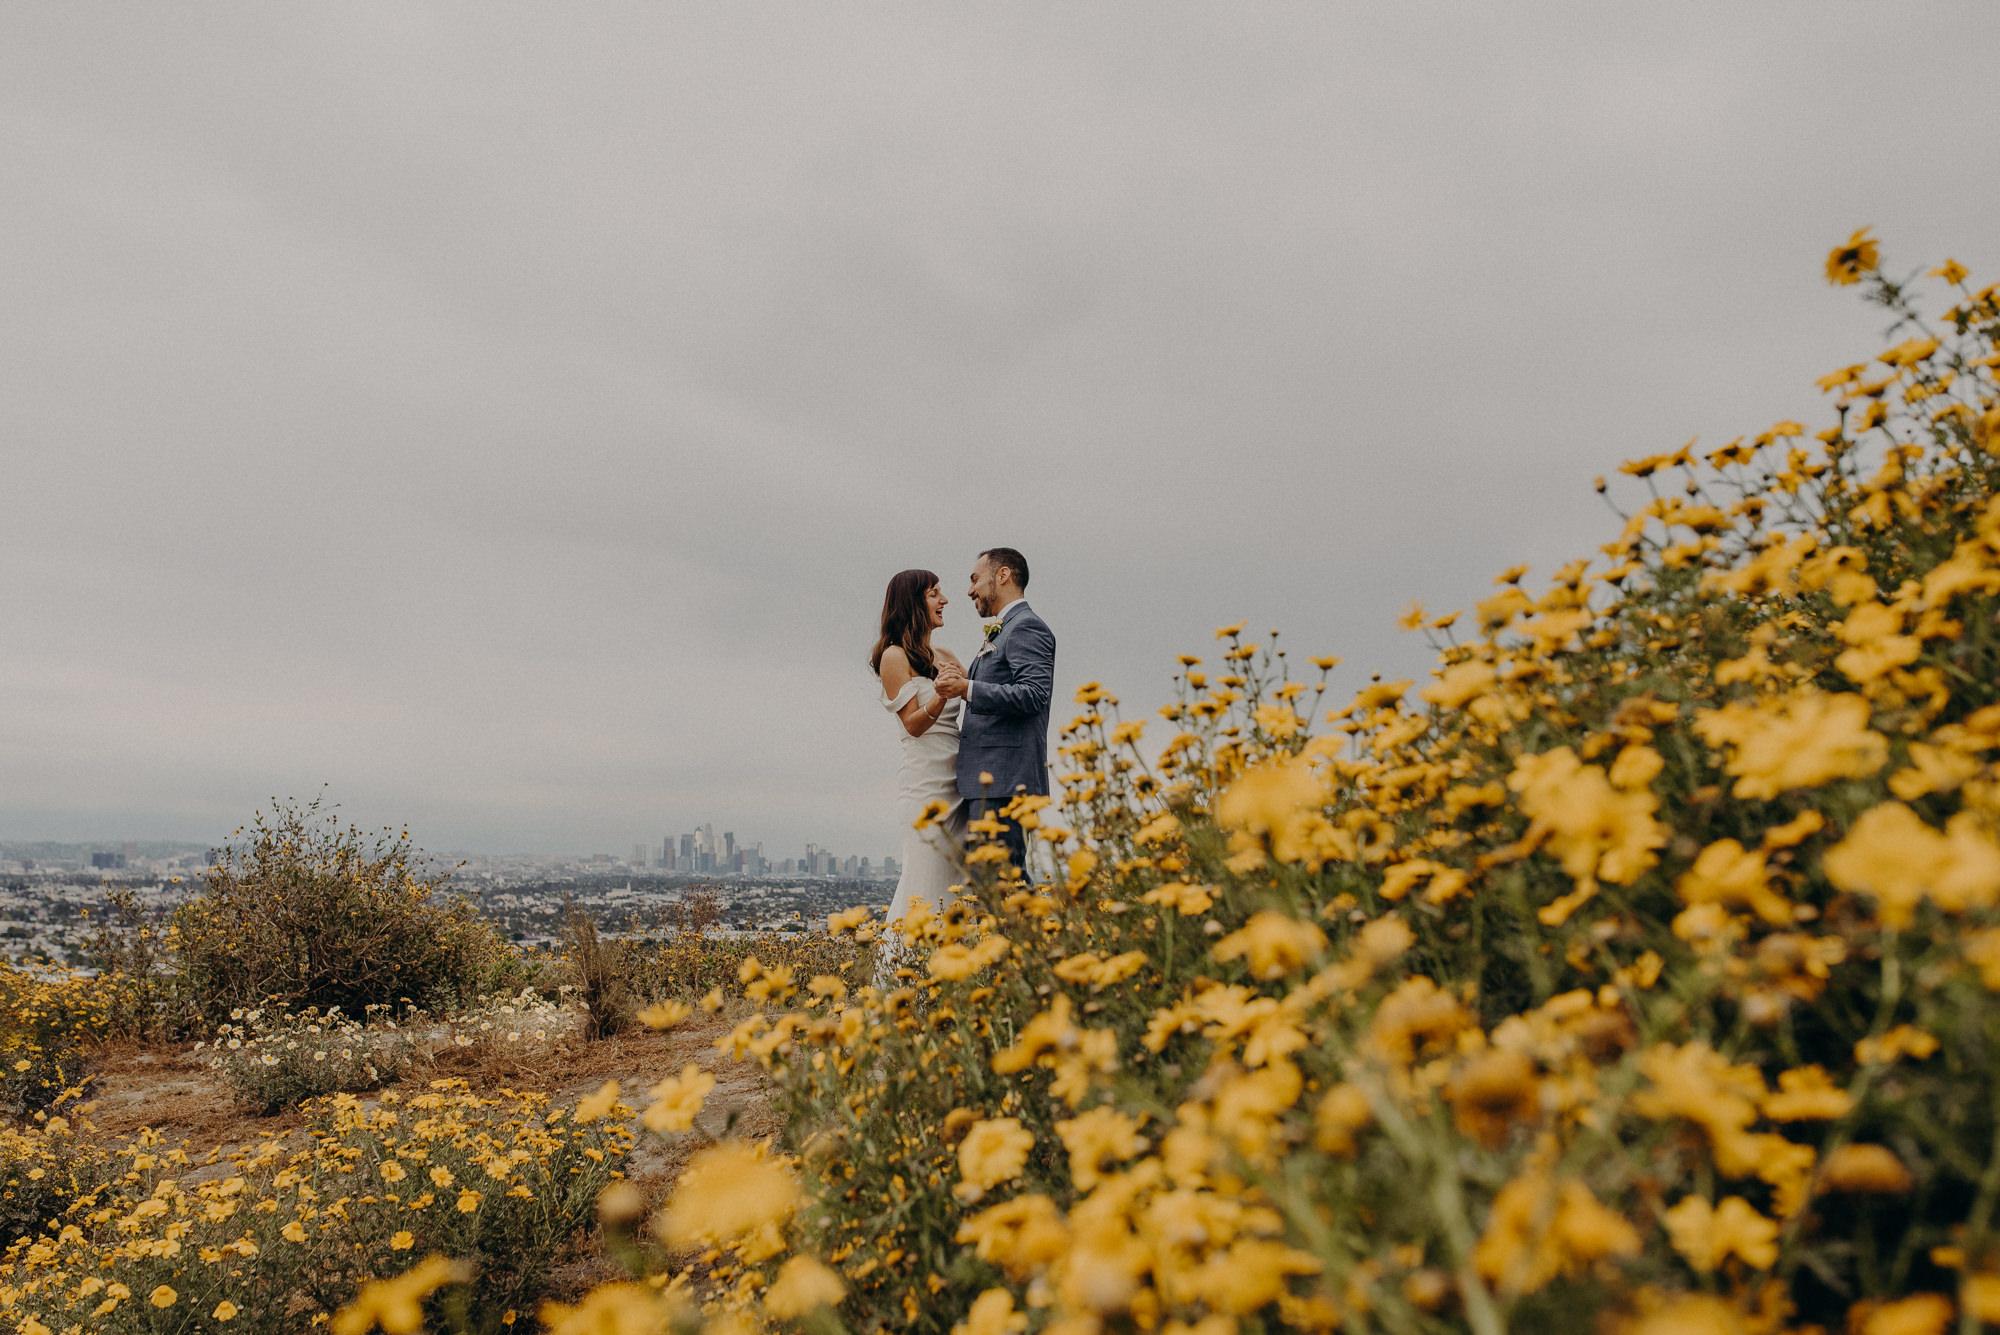 elopement photographer in los angeles - la wedding photographer - isaiahandtaylor.com-047.jpg